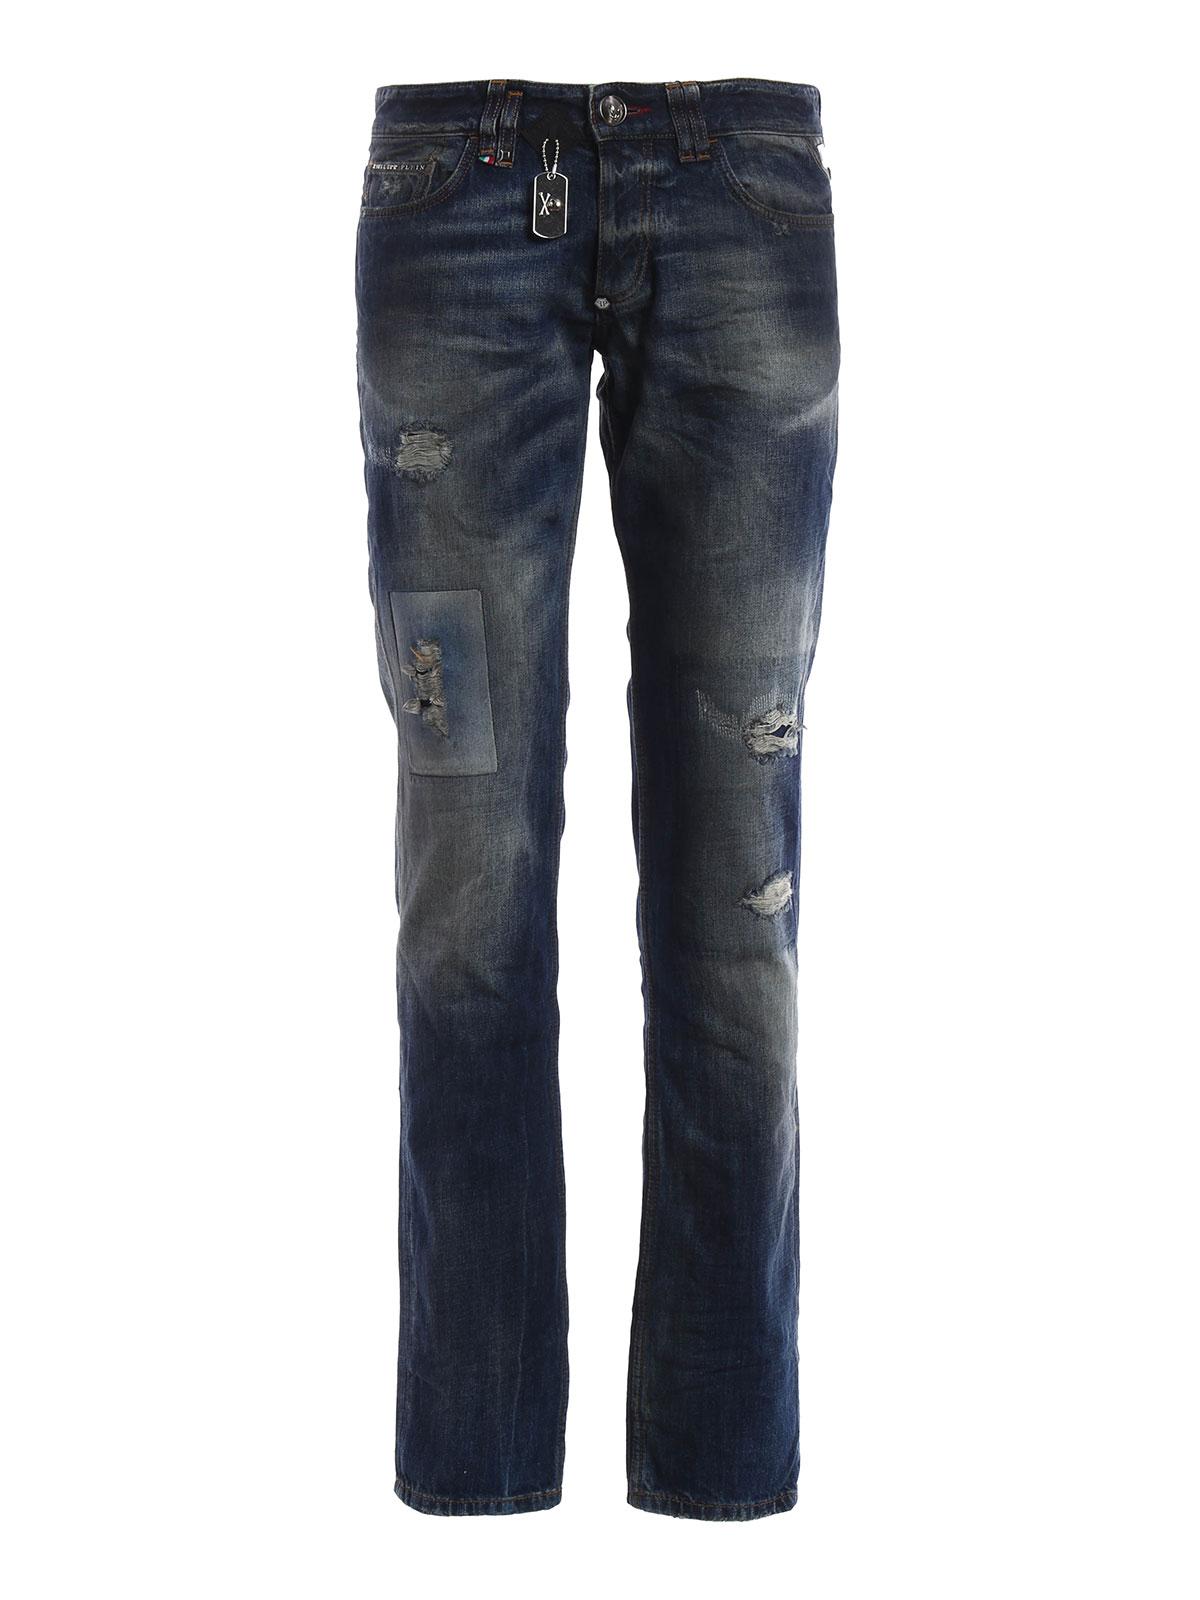 jeans deep philipp plein jeans dritti a sigaretta ikrix. Black Bedroom Furniture Sets. Home Design Ideas